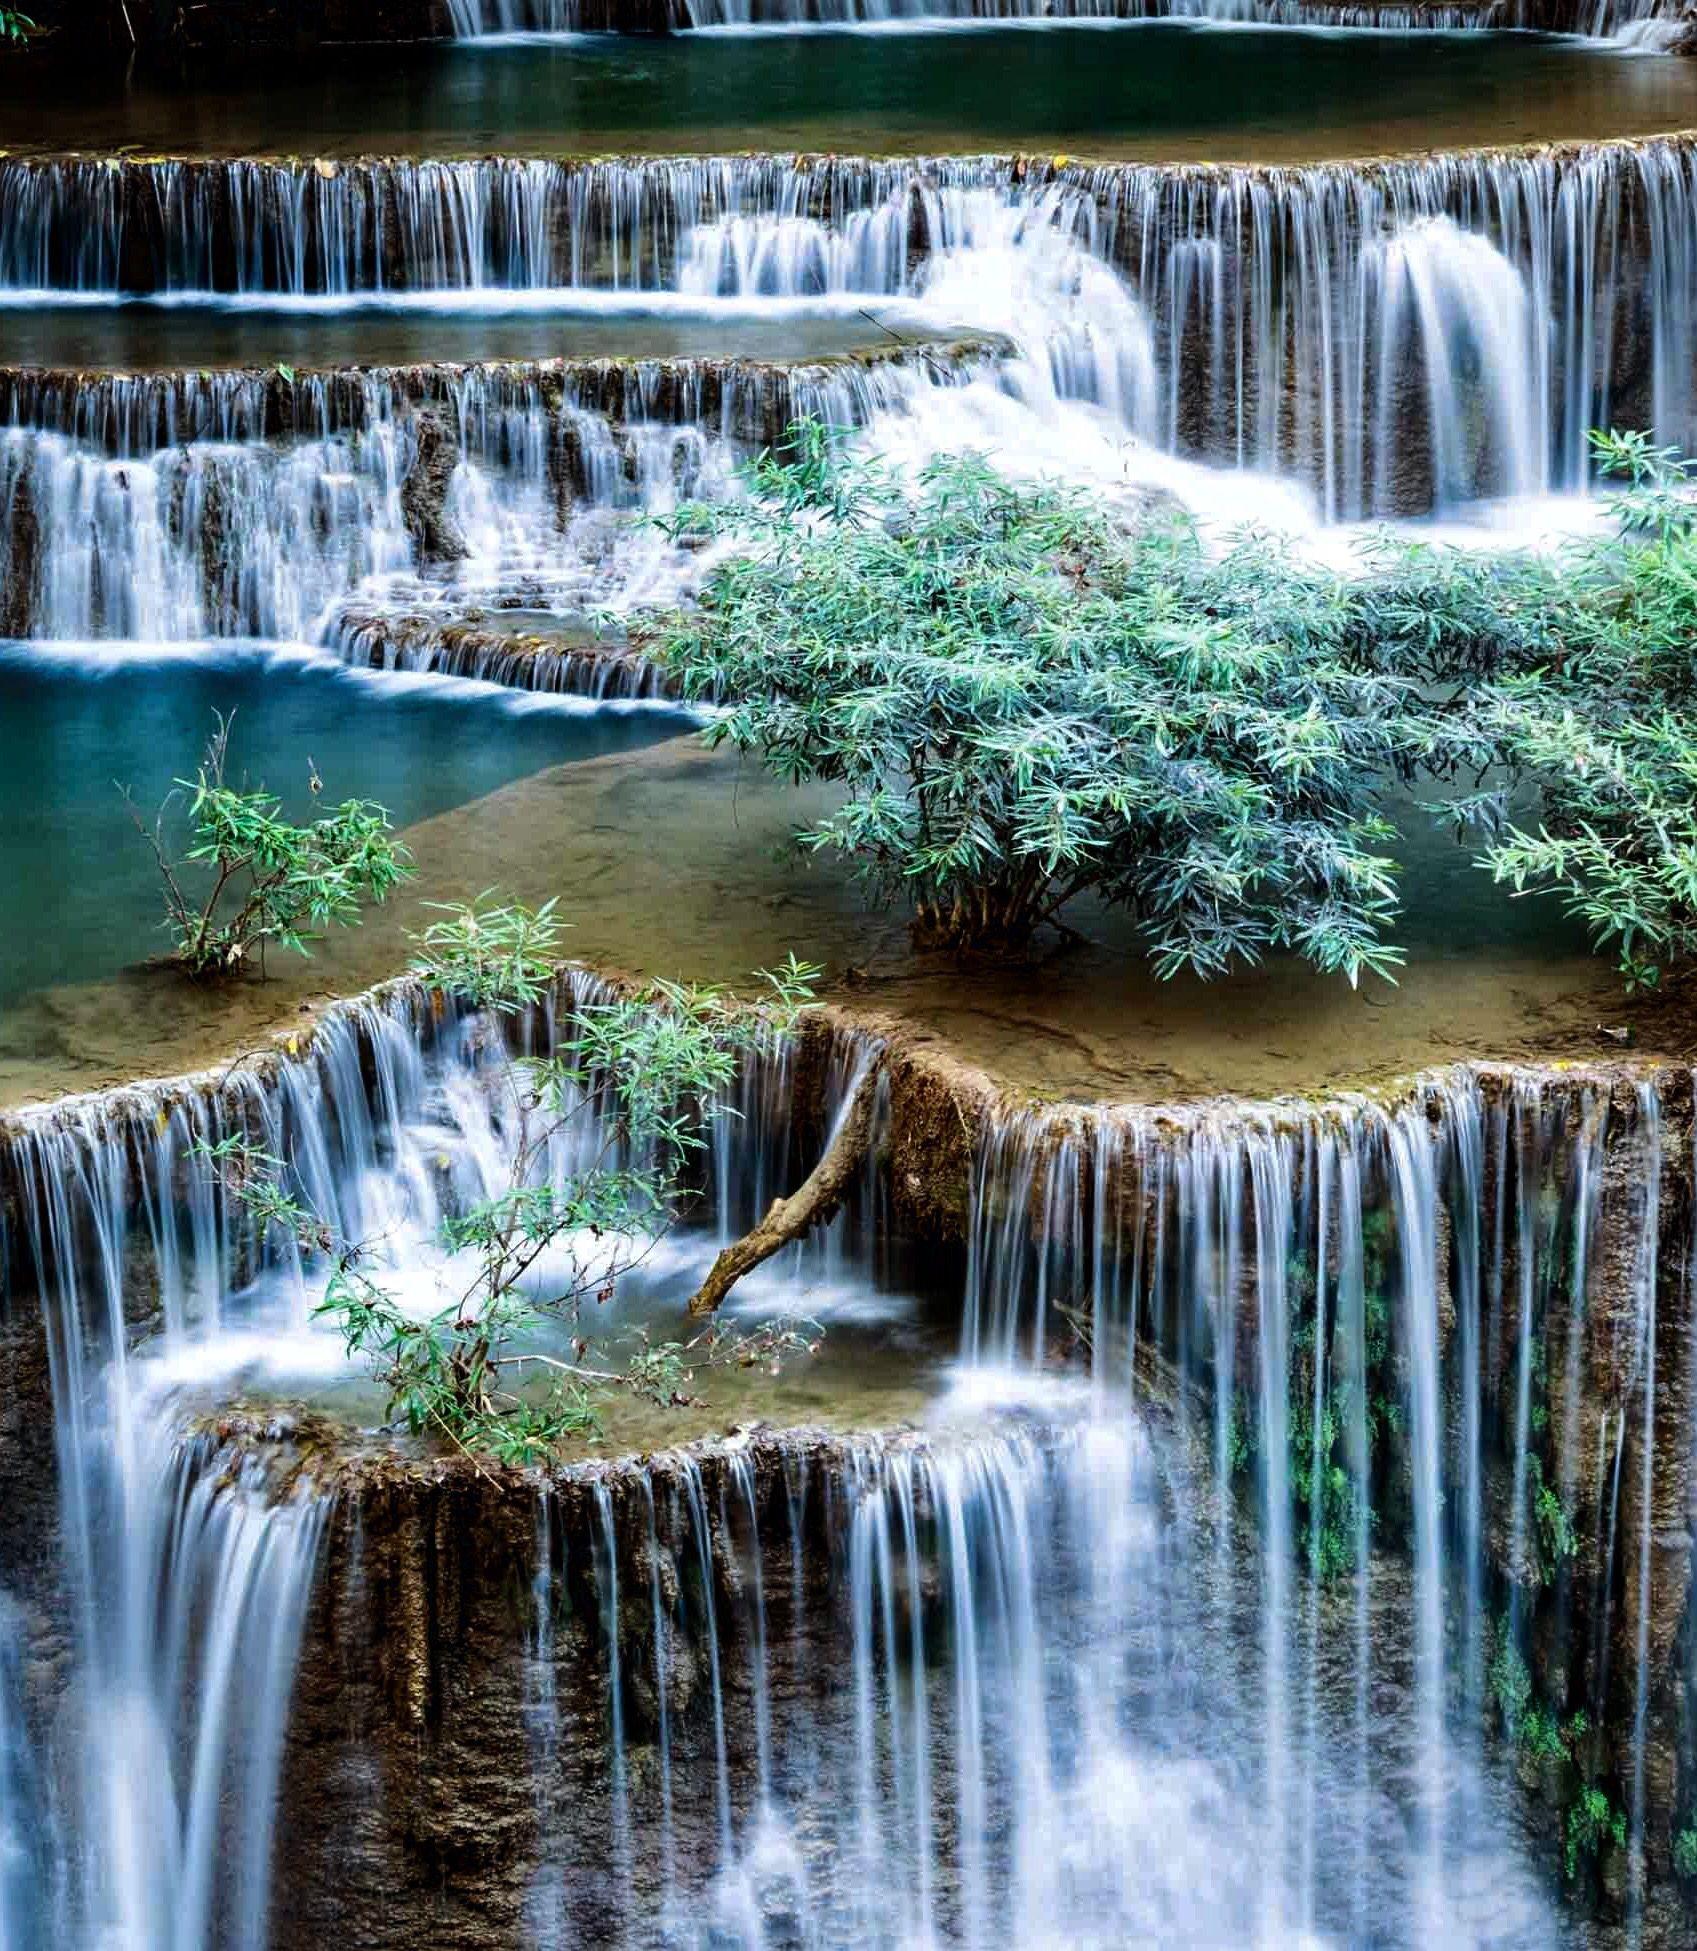 Waterfall Beautiful Nature Waterfall Scenery